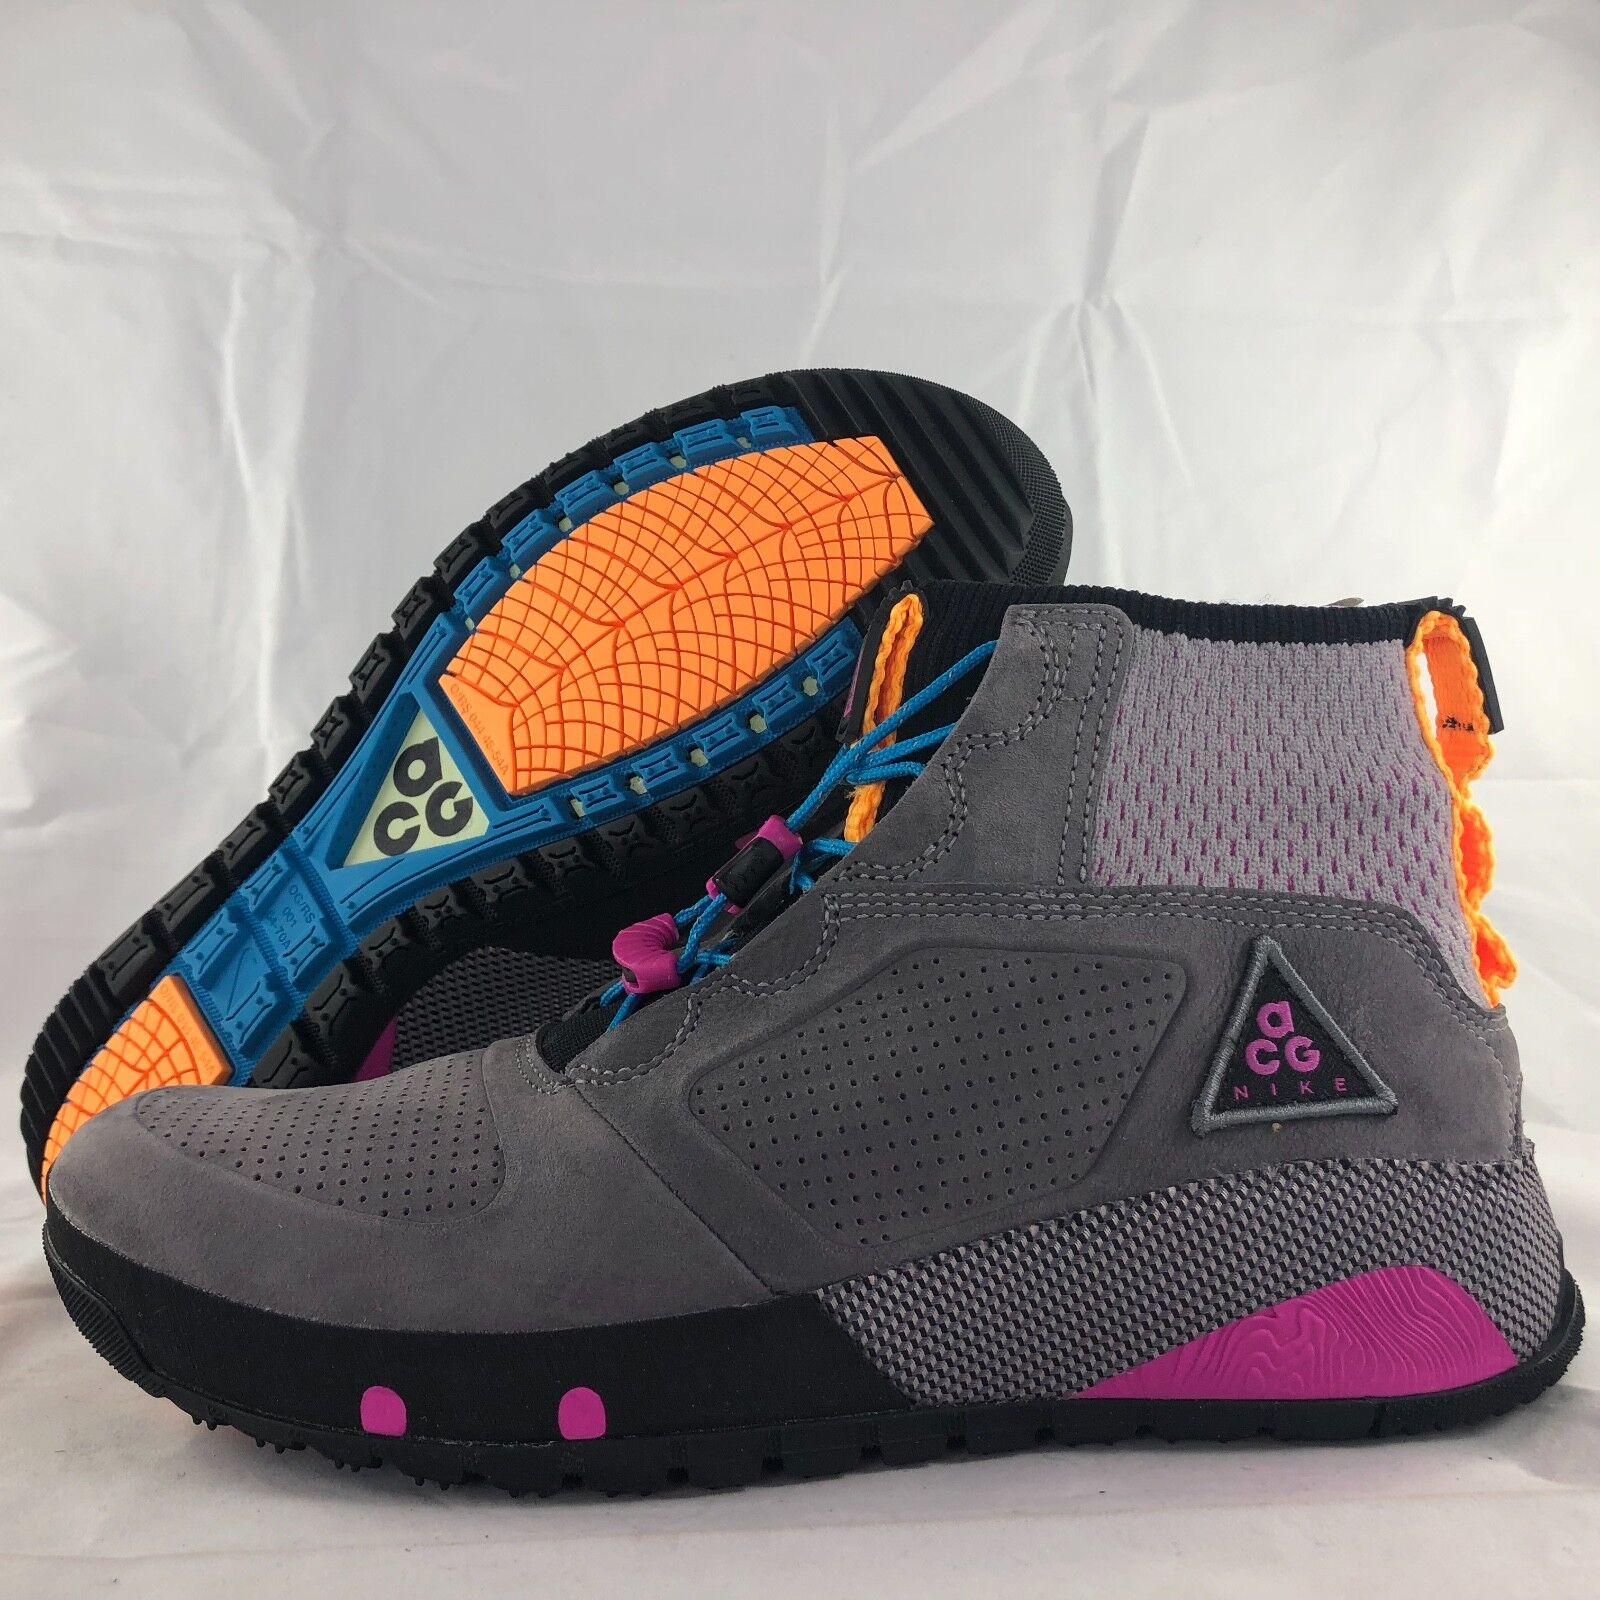 Nike ACG Ruckel Ridge Gunsmoke Grey Purple orange Black AQ9333-001 Men's 7-12.5